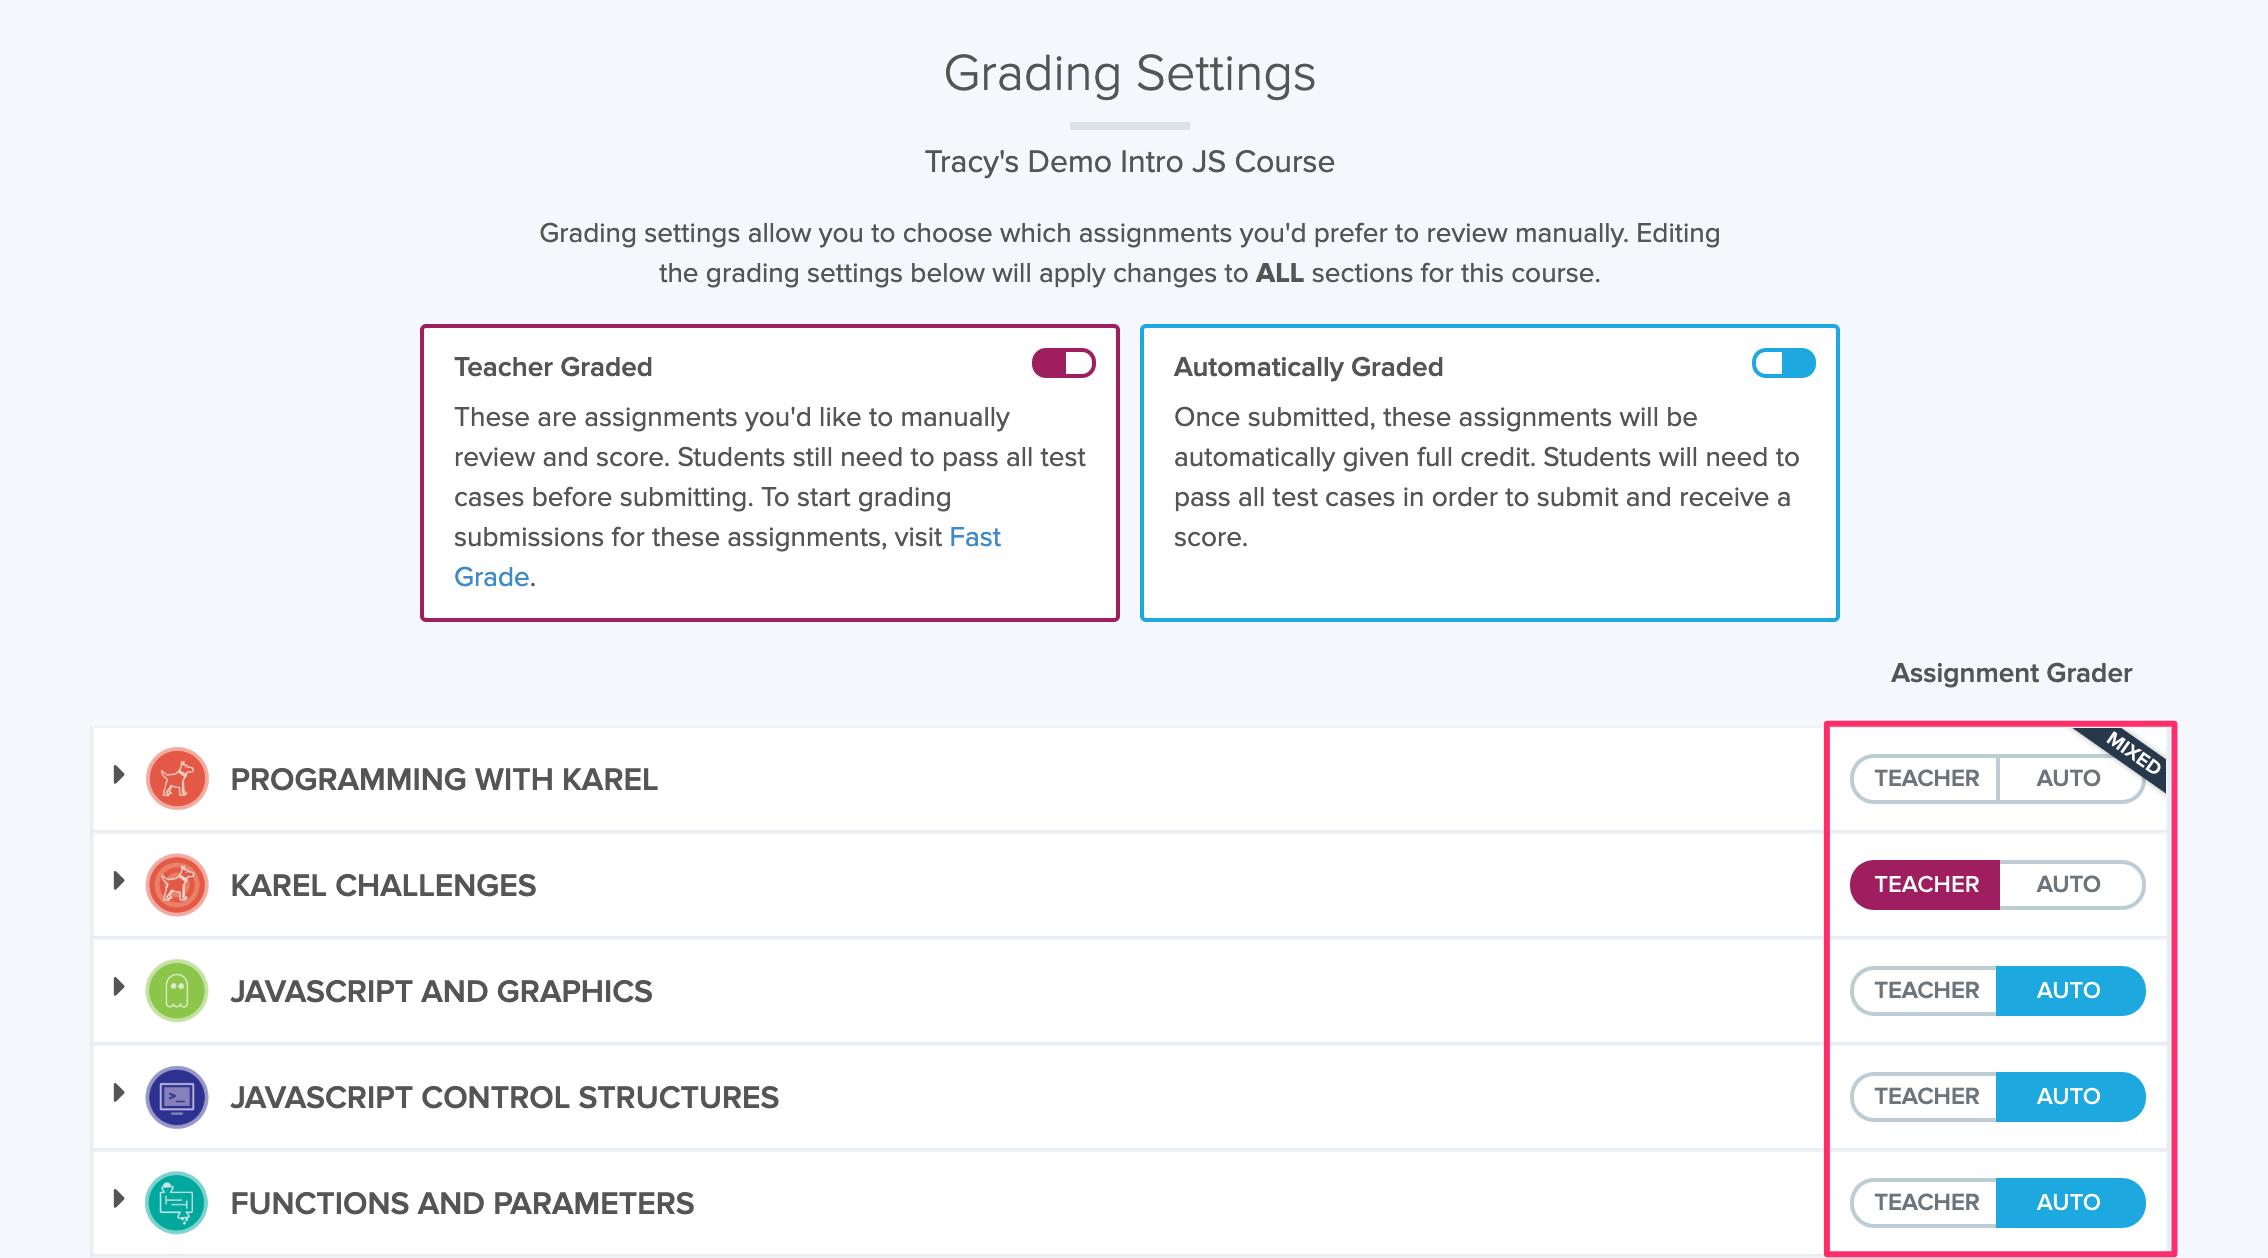 Image showing Grading Settings